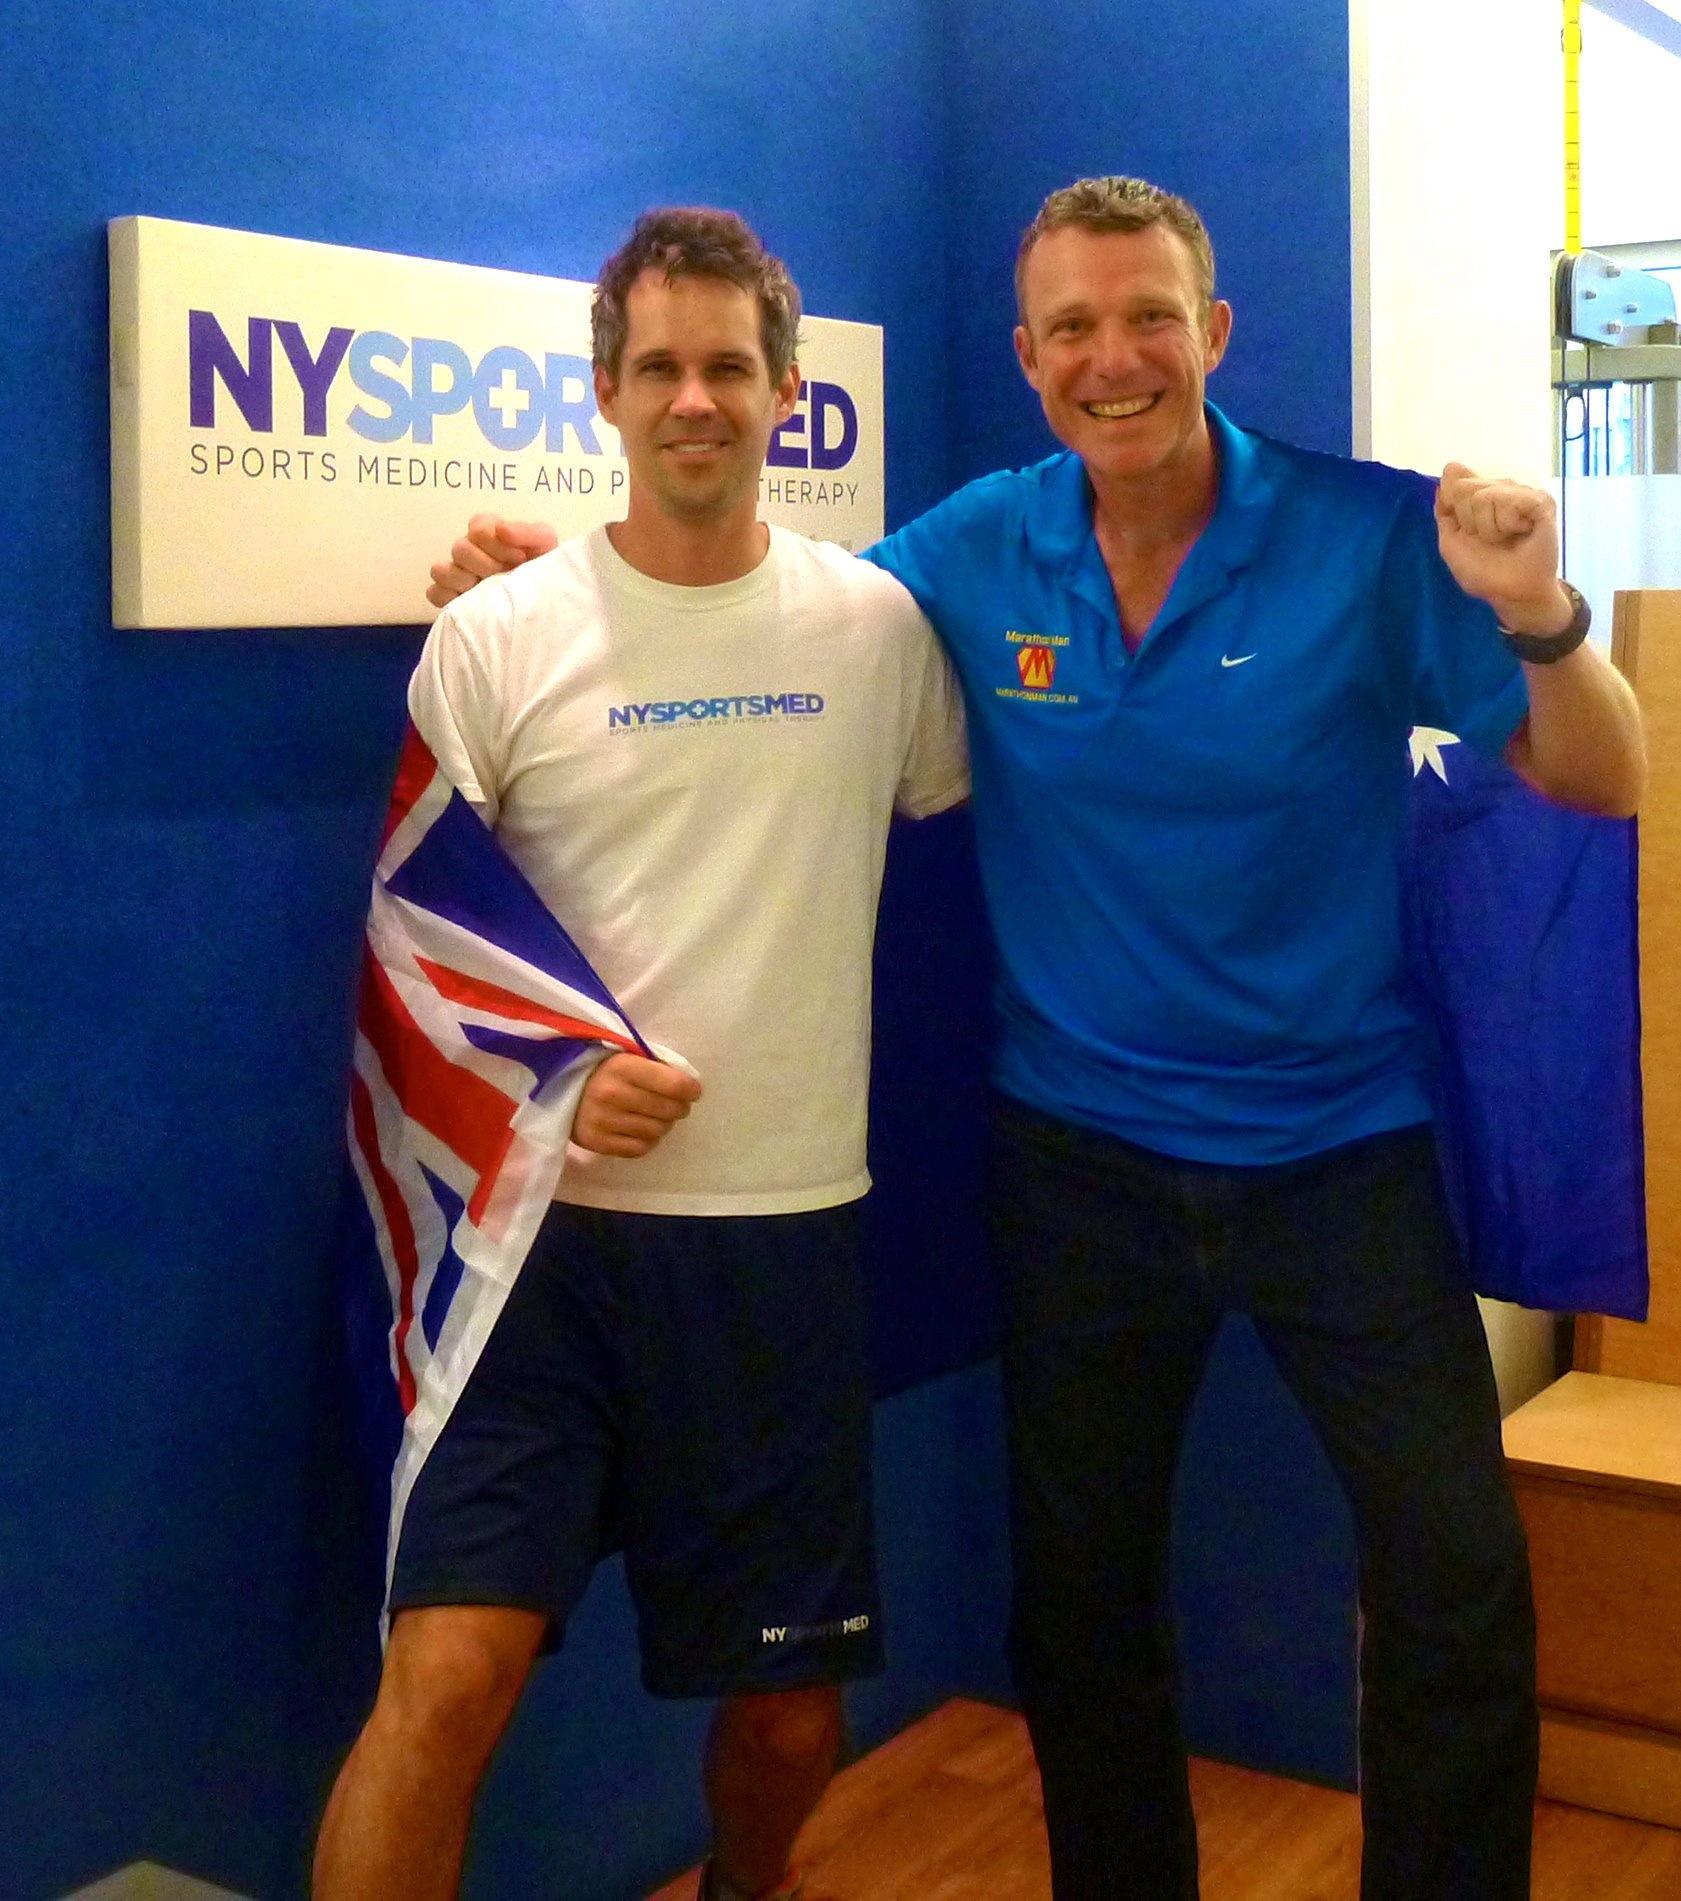 Trent Morrow, 'Marathon Man' - World Record marathons (160) in 1 year over 7 continents